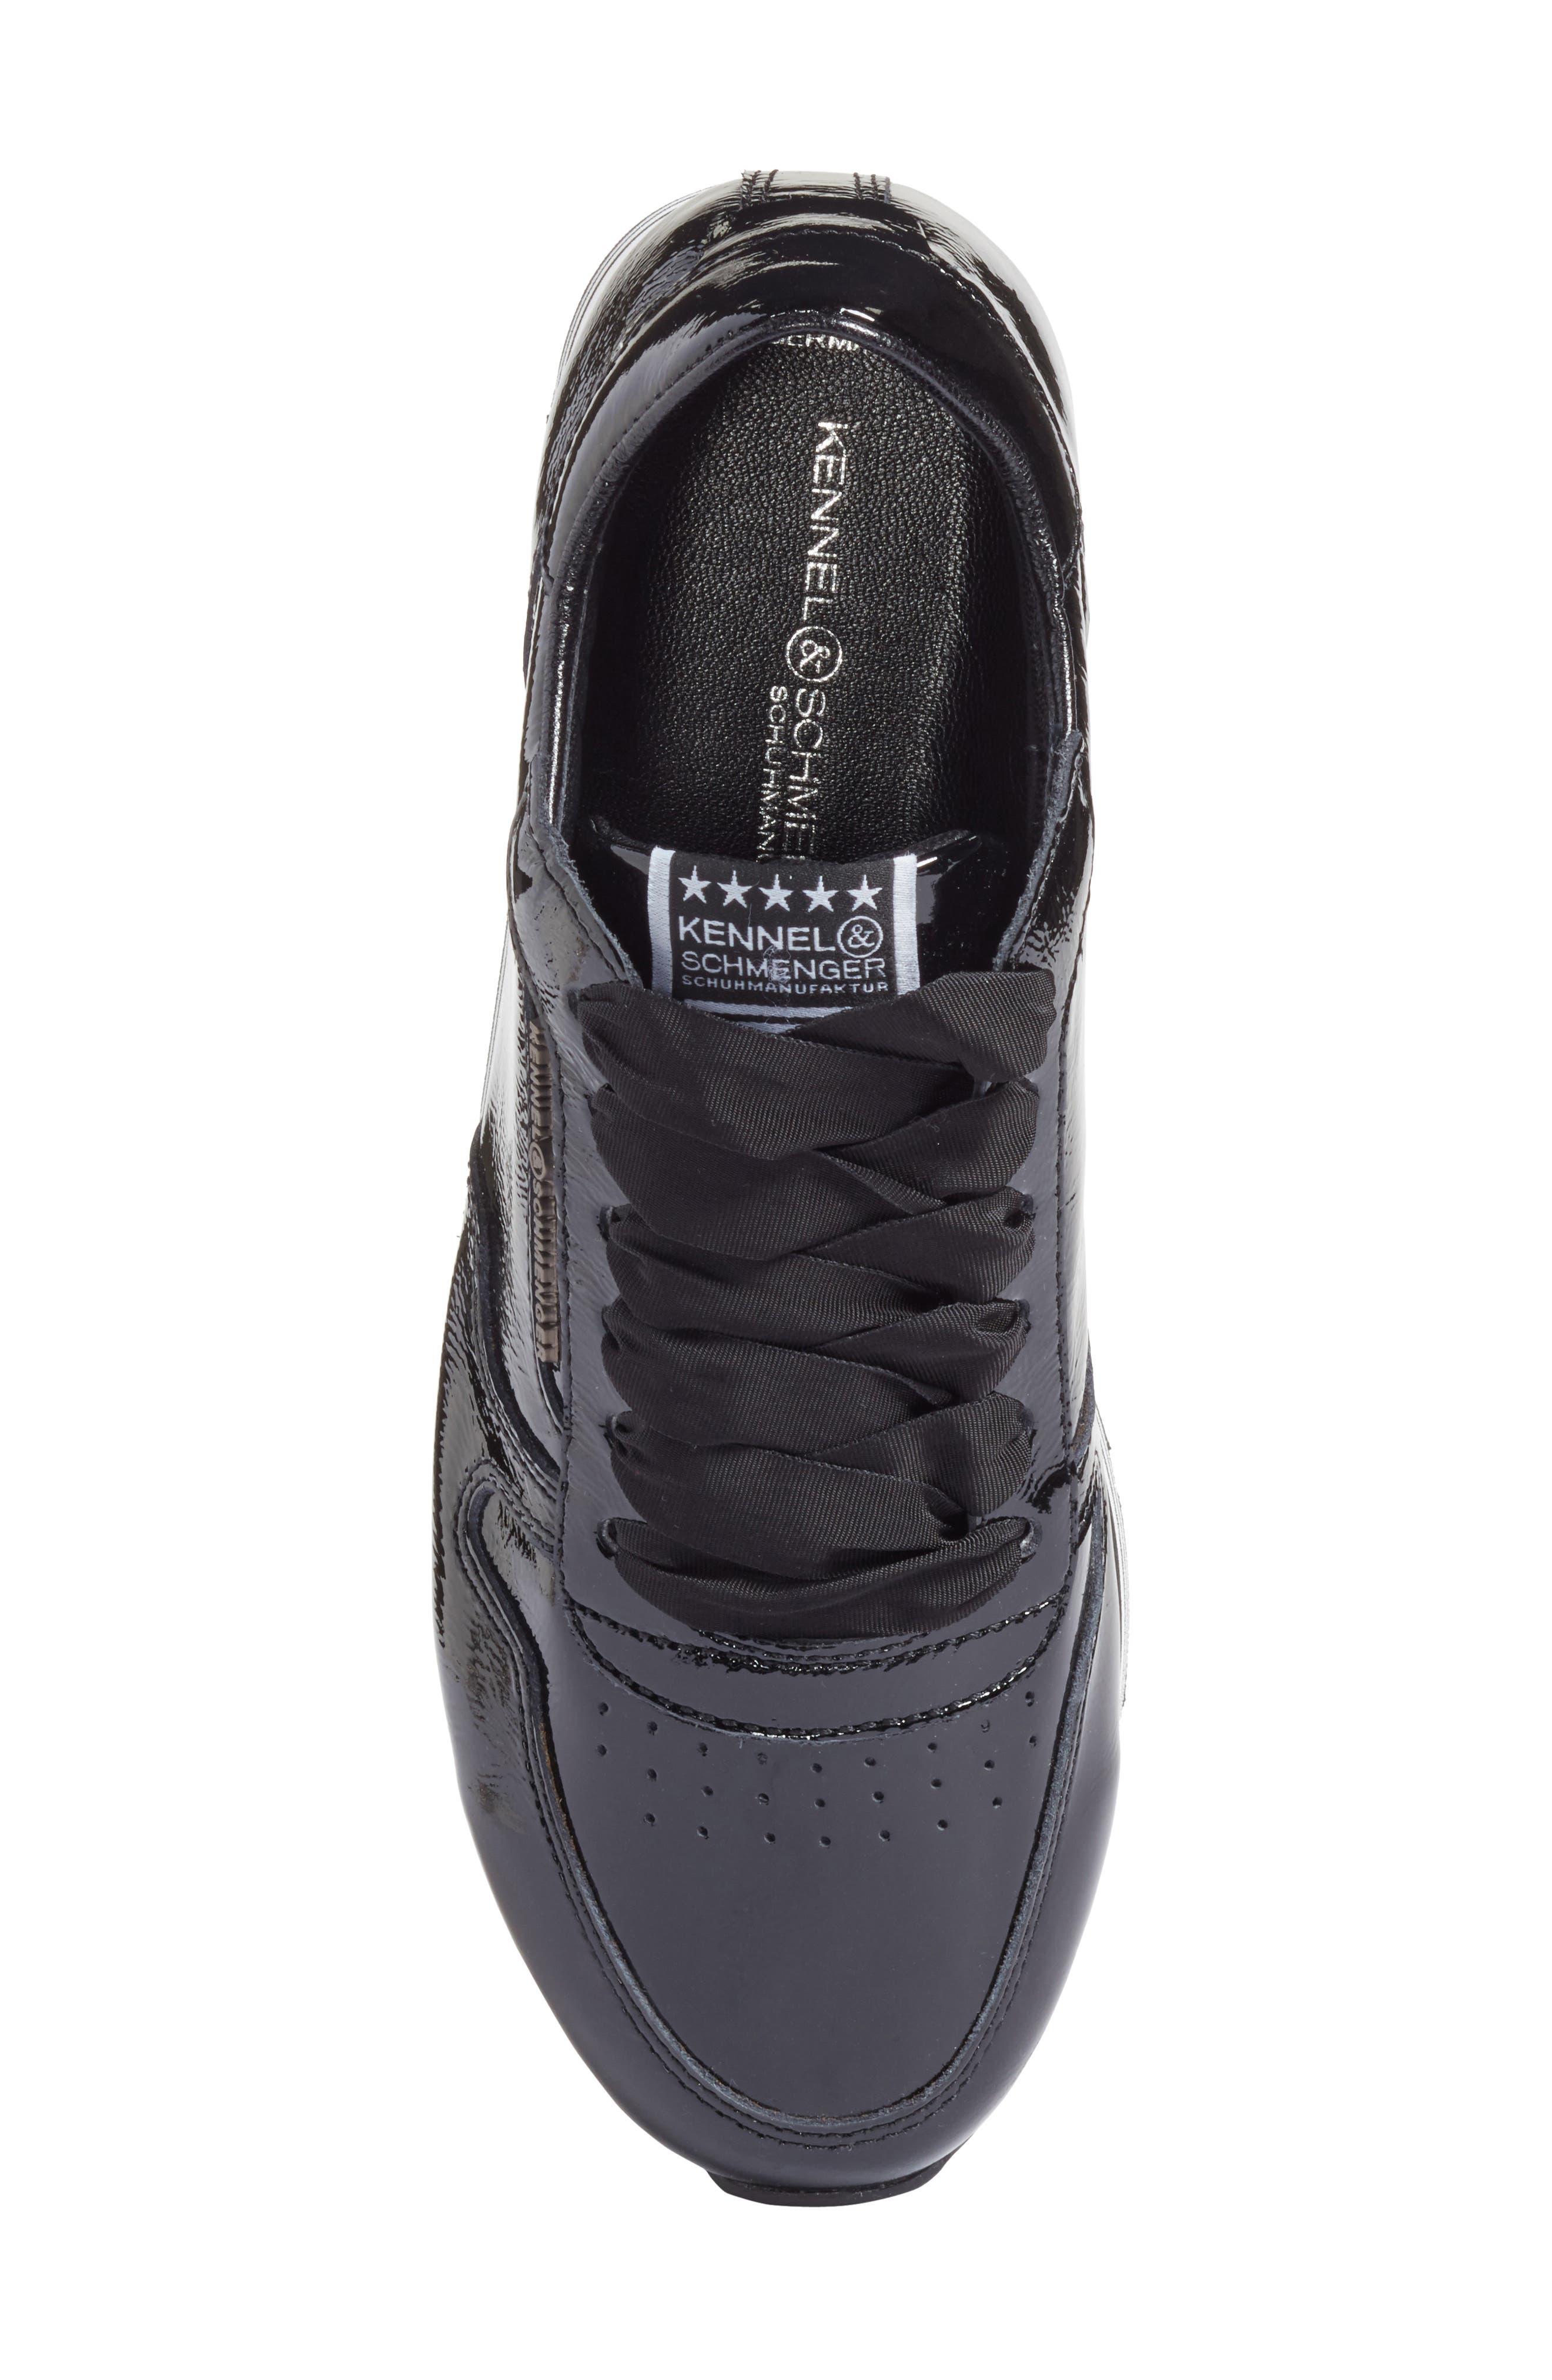 Kennel & Schmenger Nova Patent Leather Sneaker,                             Alternate thumbnail 5, color,                             Black